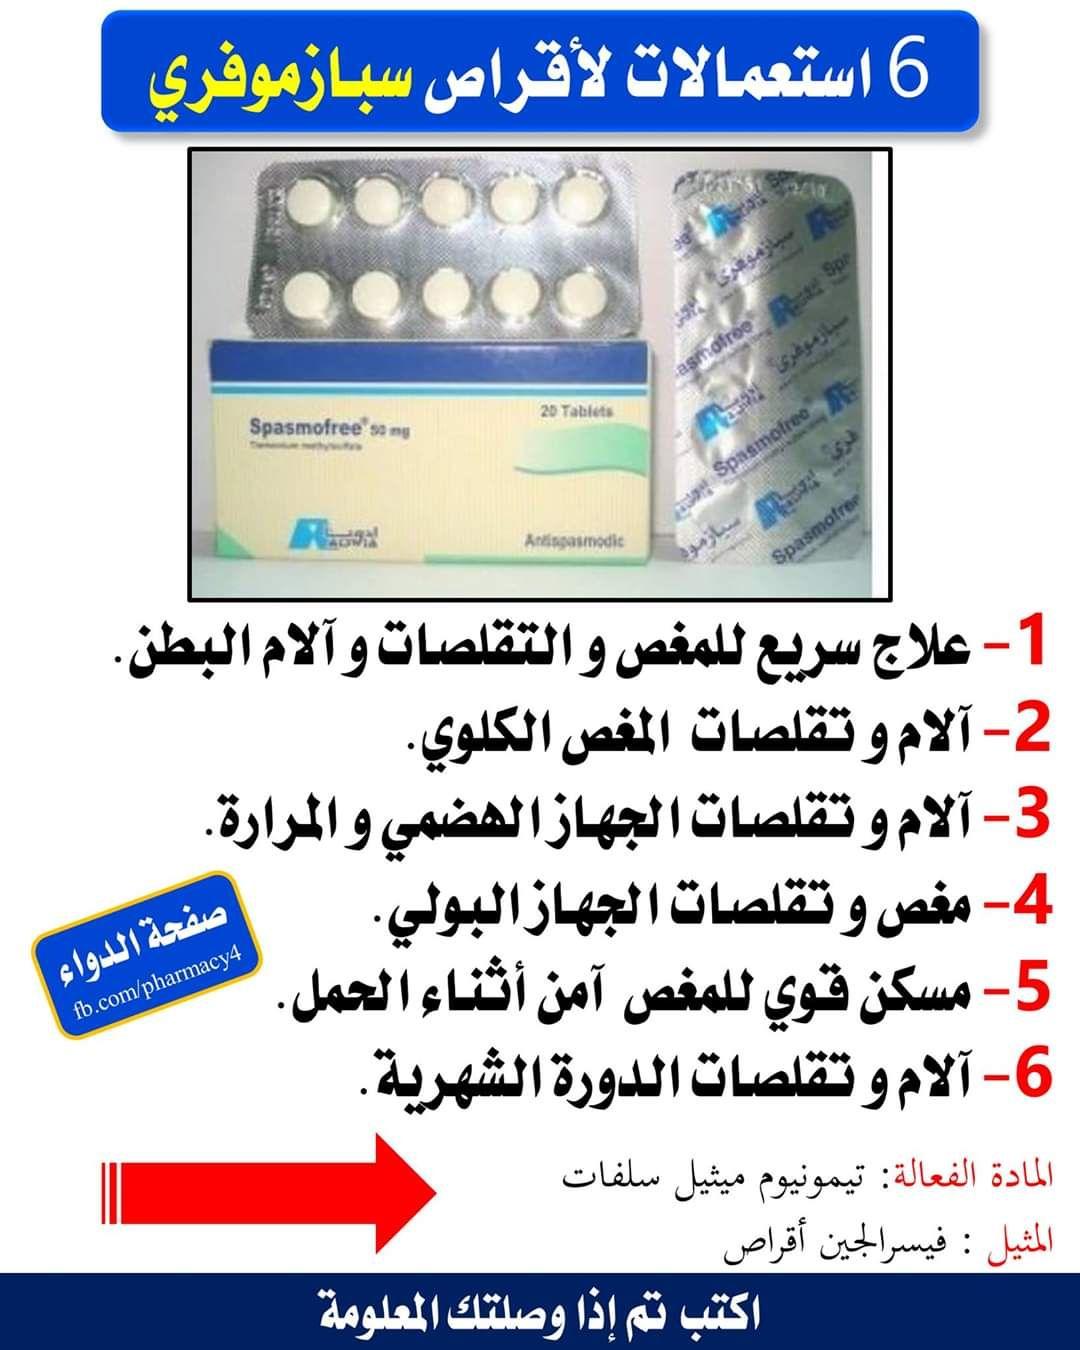 Pin By منوعات مفيدة On صحة Medical Information Health Healthy Health